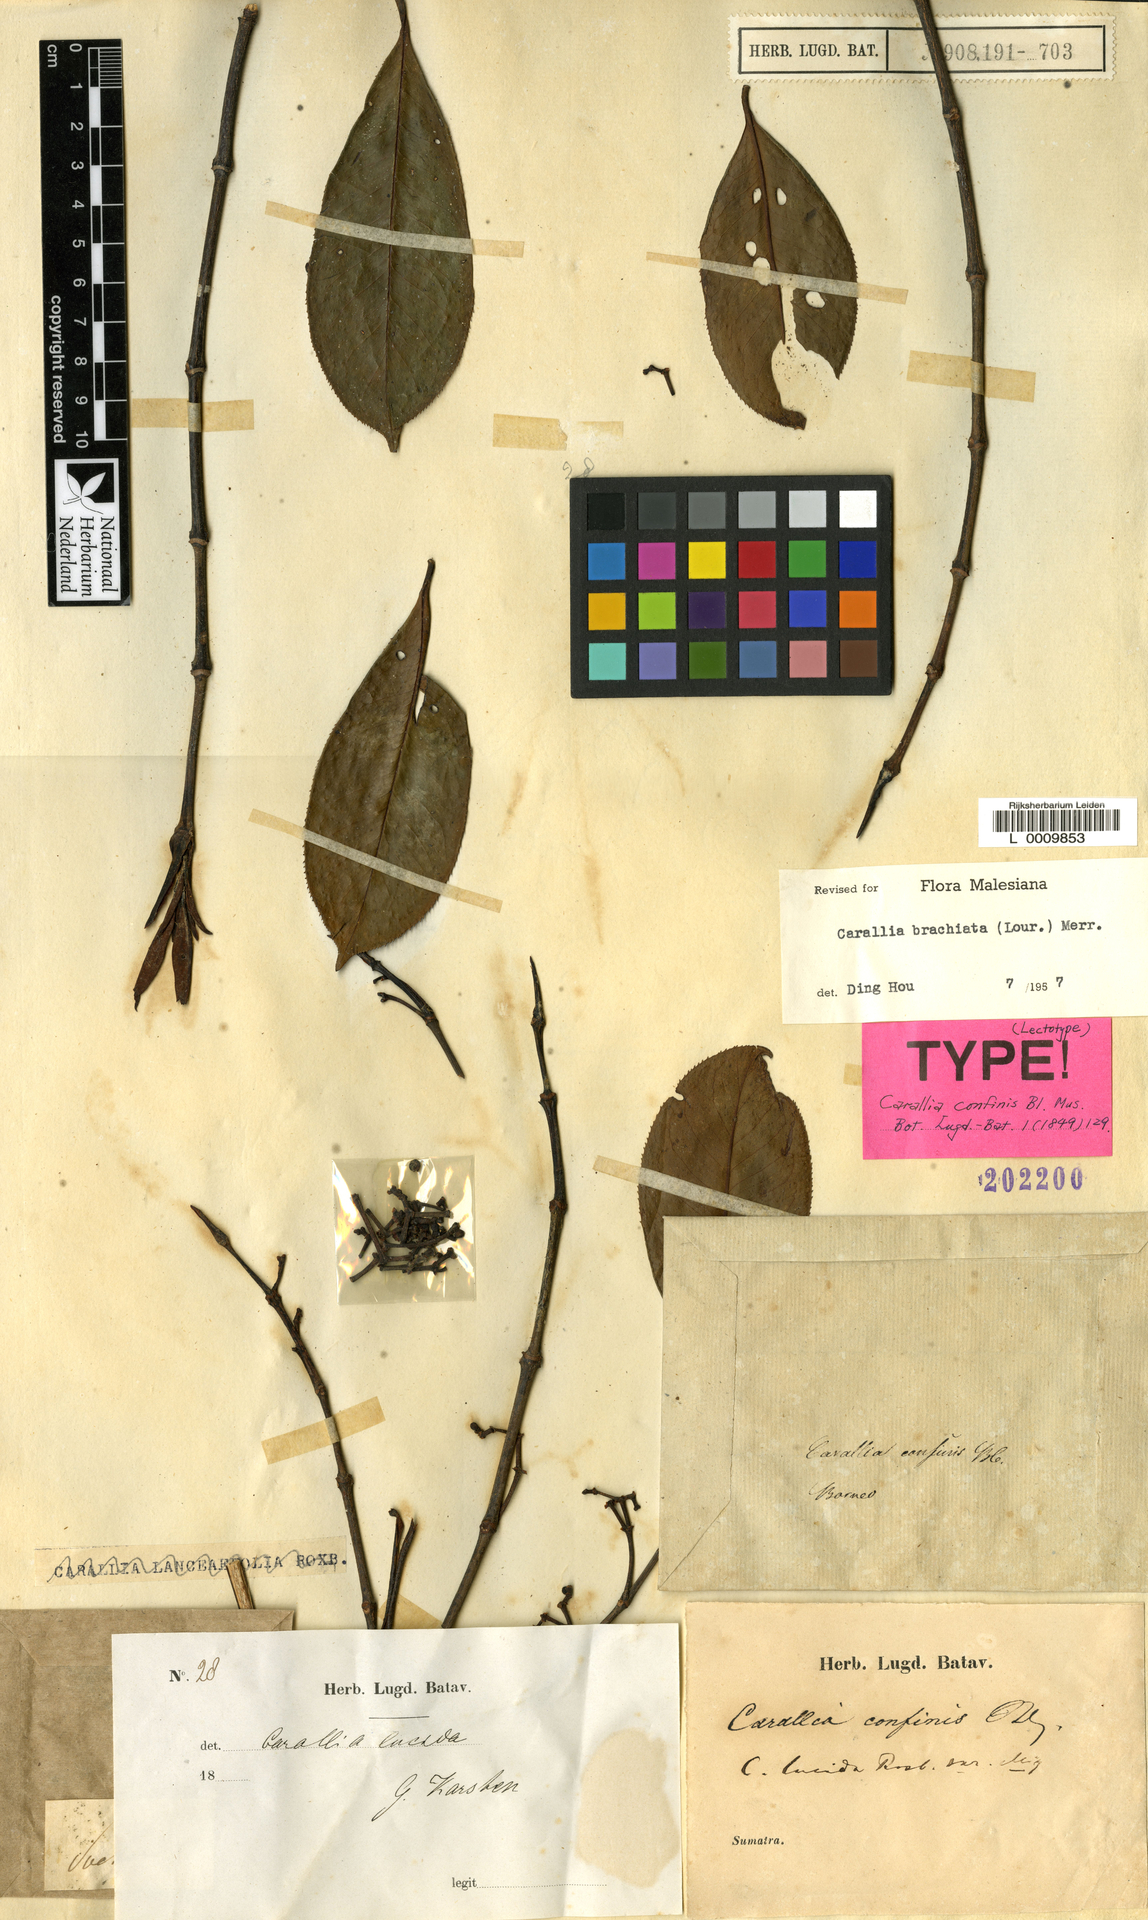 L  0009853 | Carallia brachiata (Lour.) Merr.